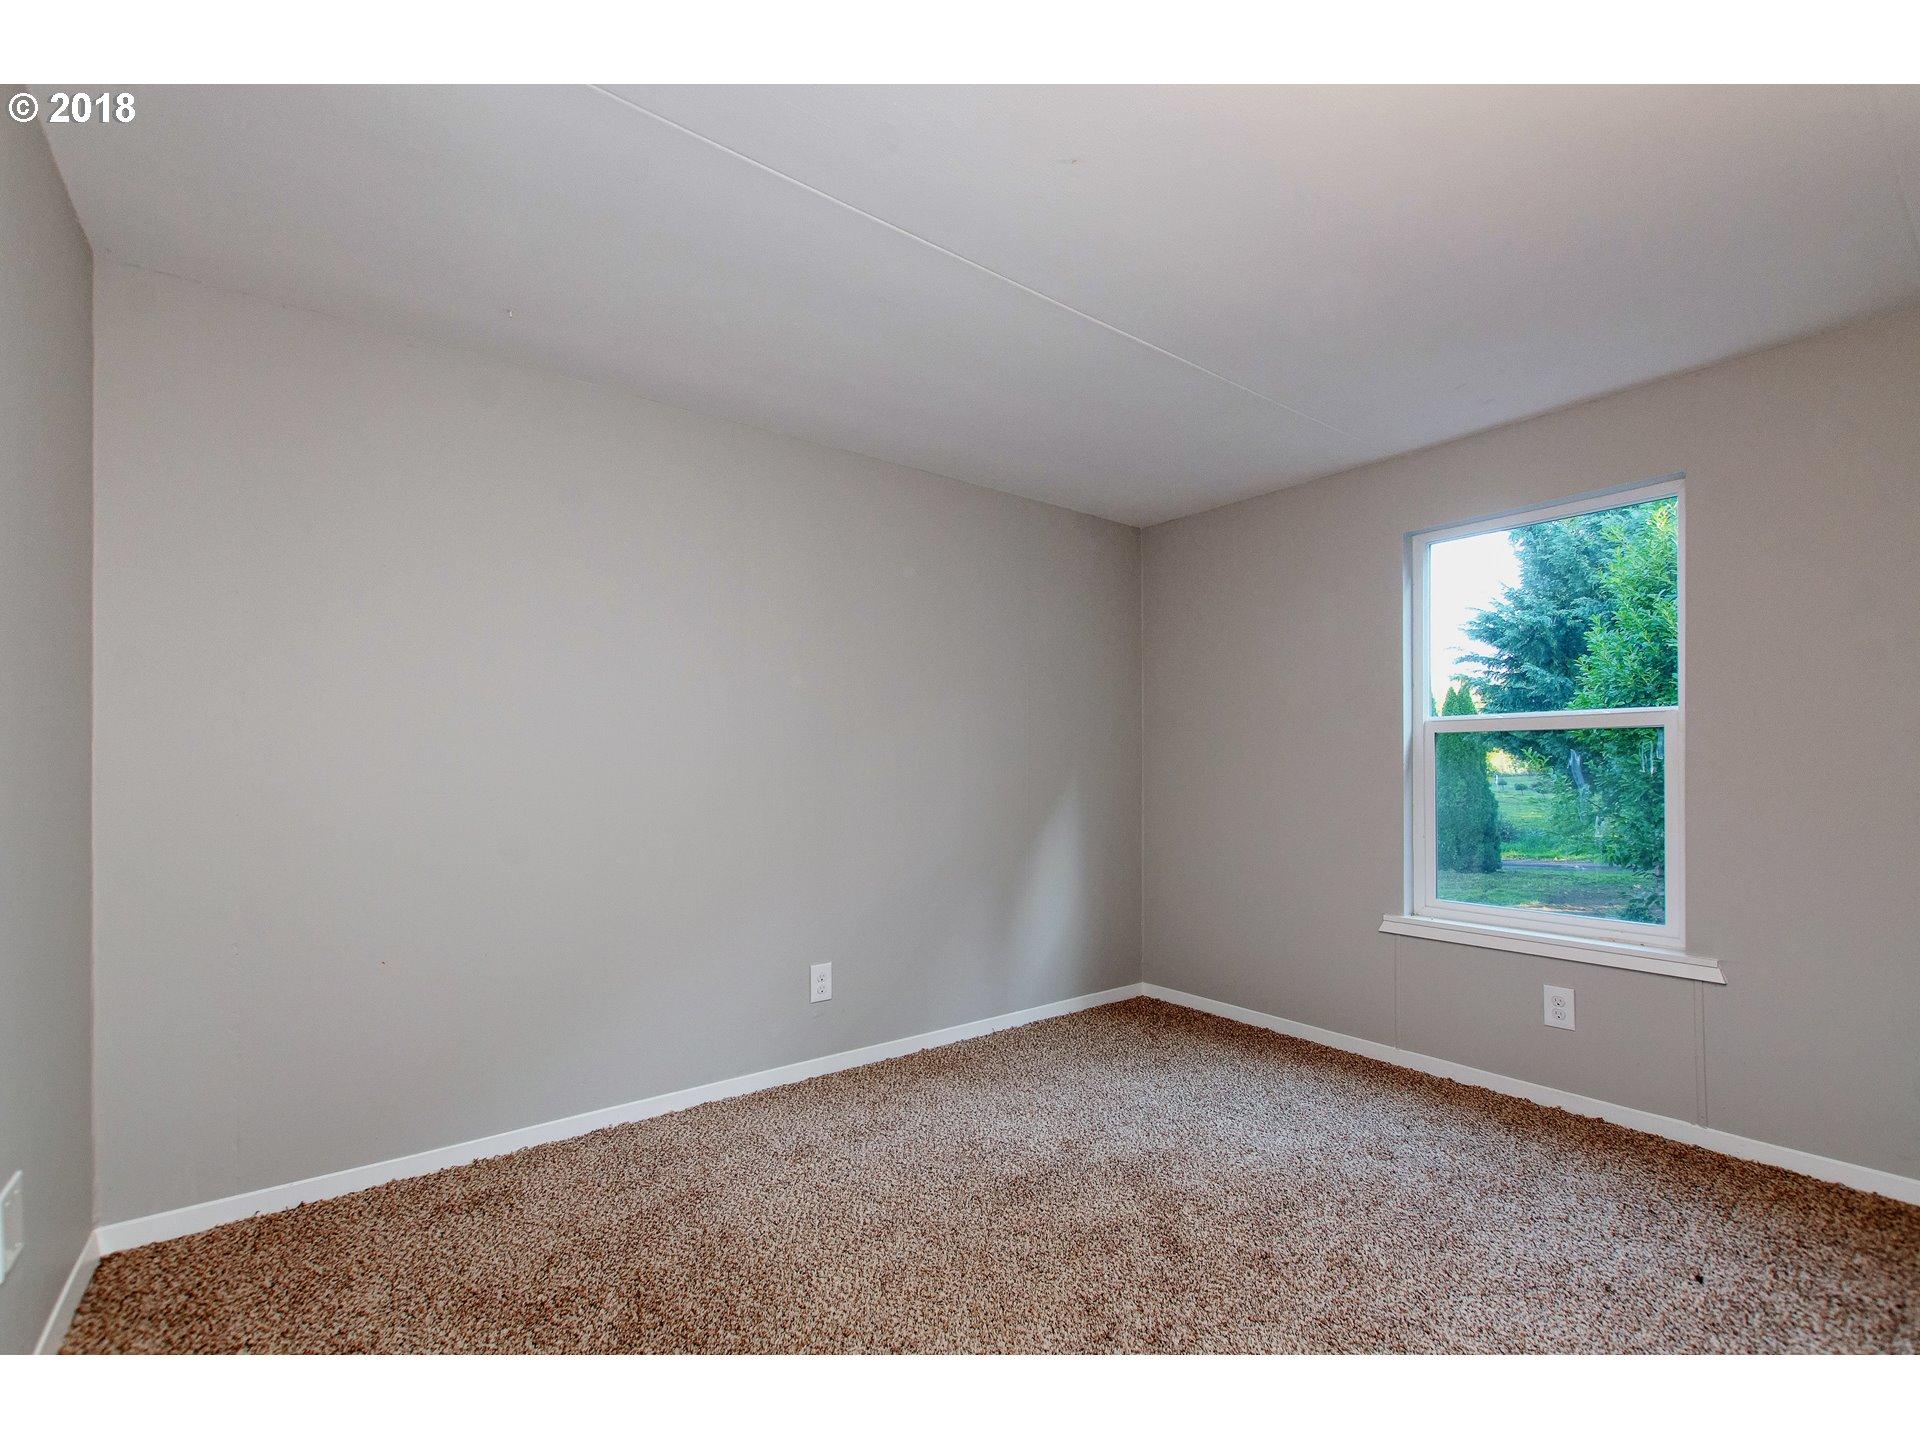 45114 NE 89TH AVE Woodland, WA 98674 - MLS #: 18624314